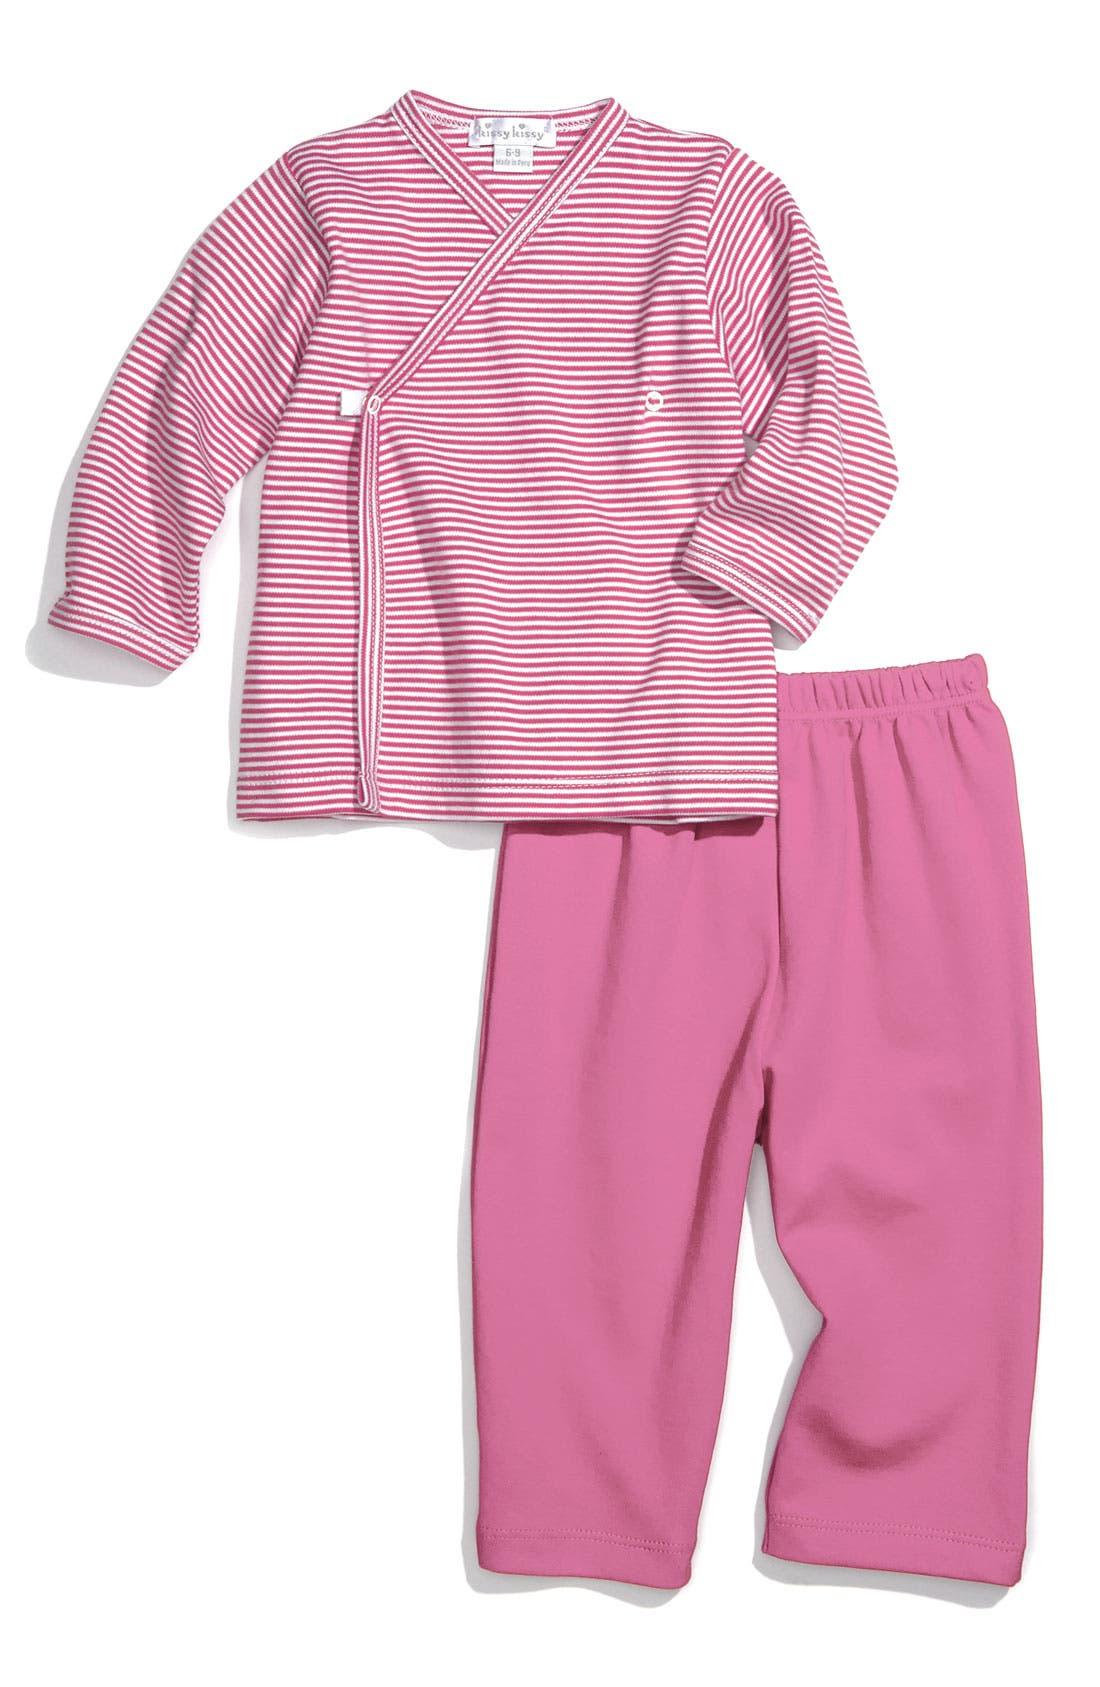 Alternate Image 1 Selected - Kissy Kissy Top & Pants Set (Baby)